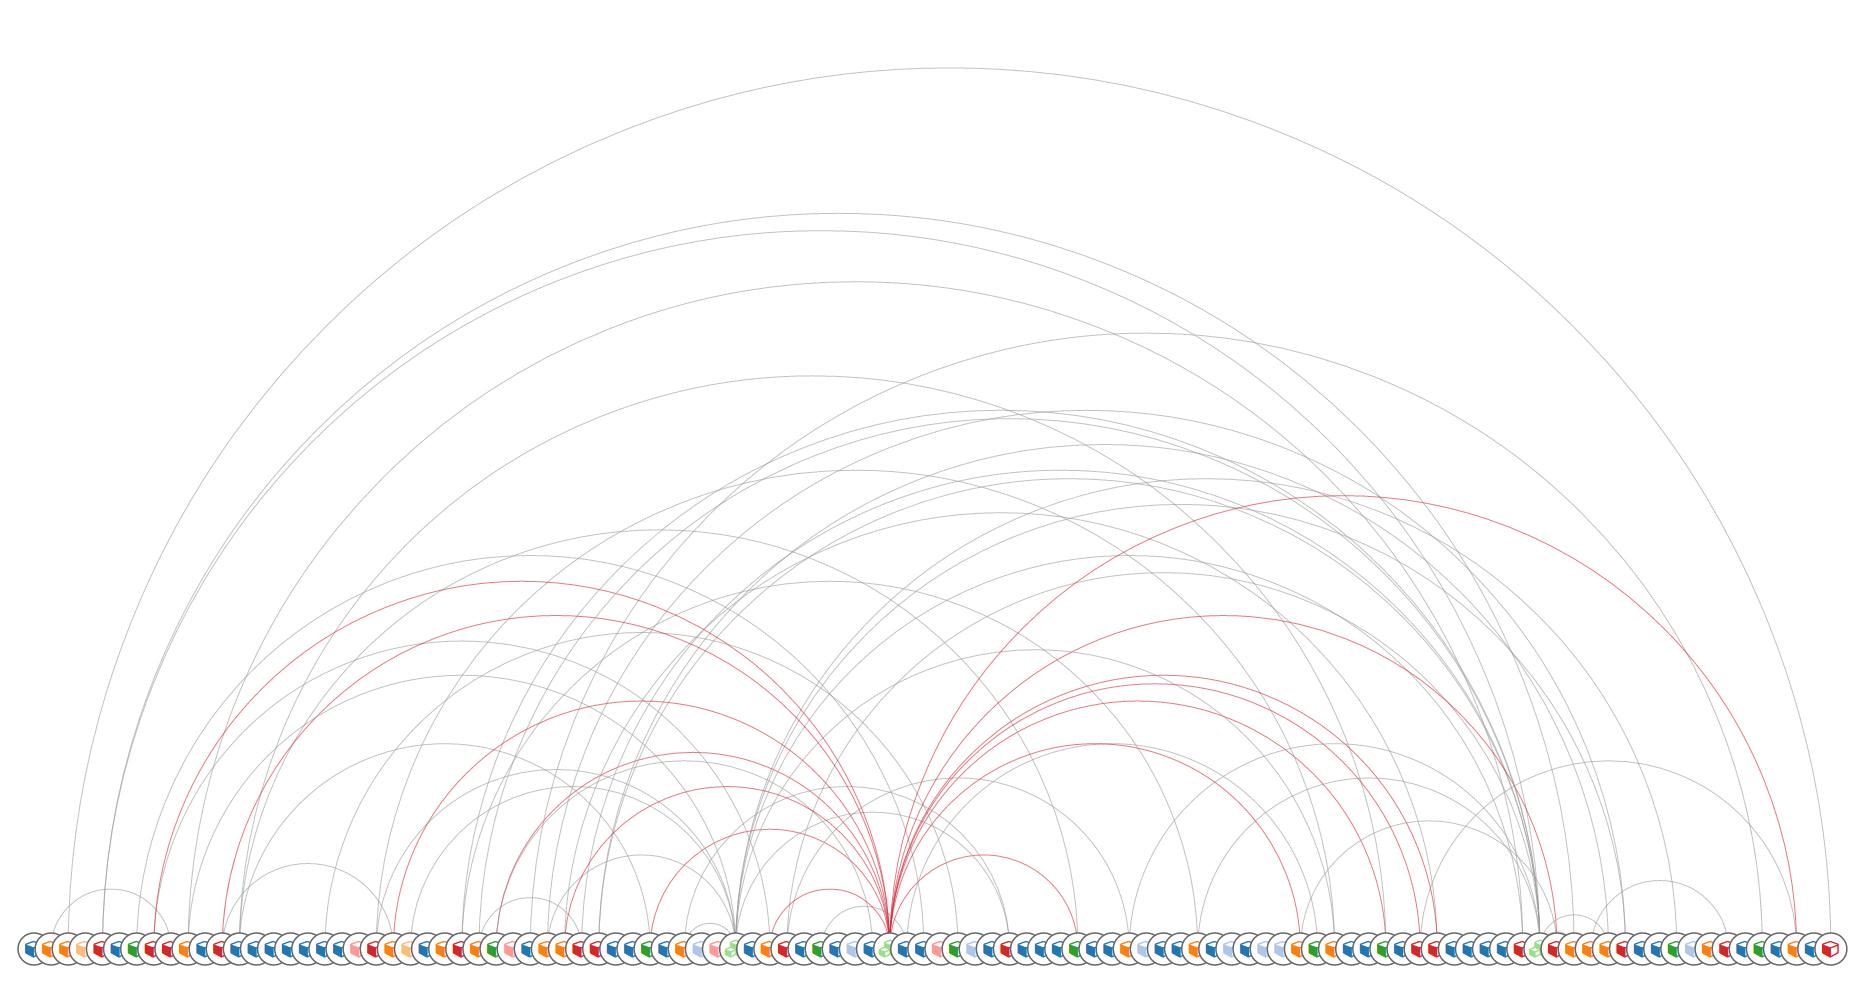 ./doc/source/static/img/arc-diagram.png